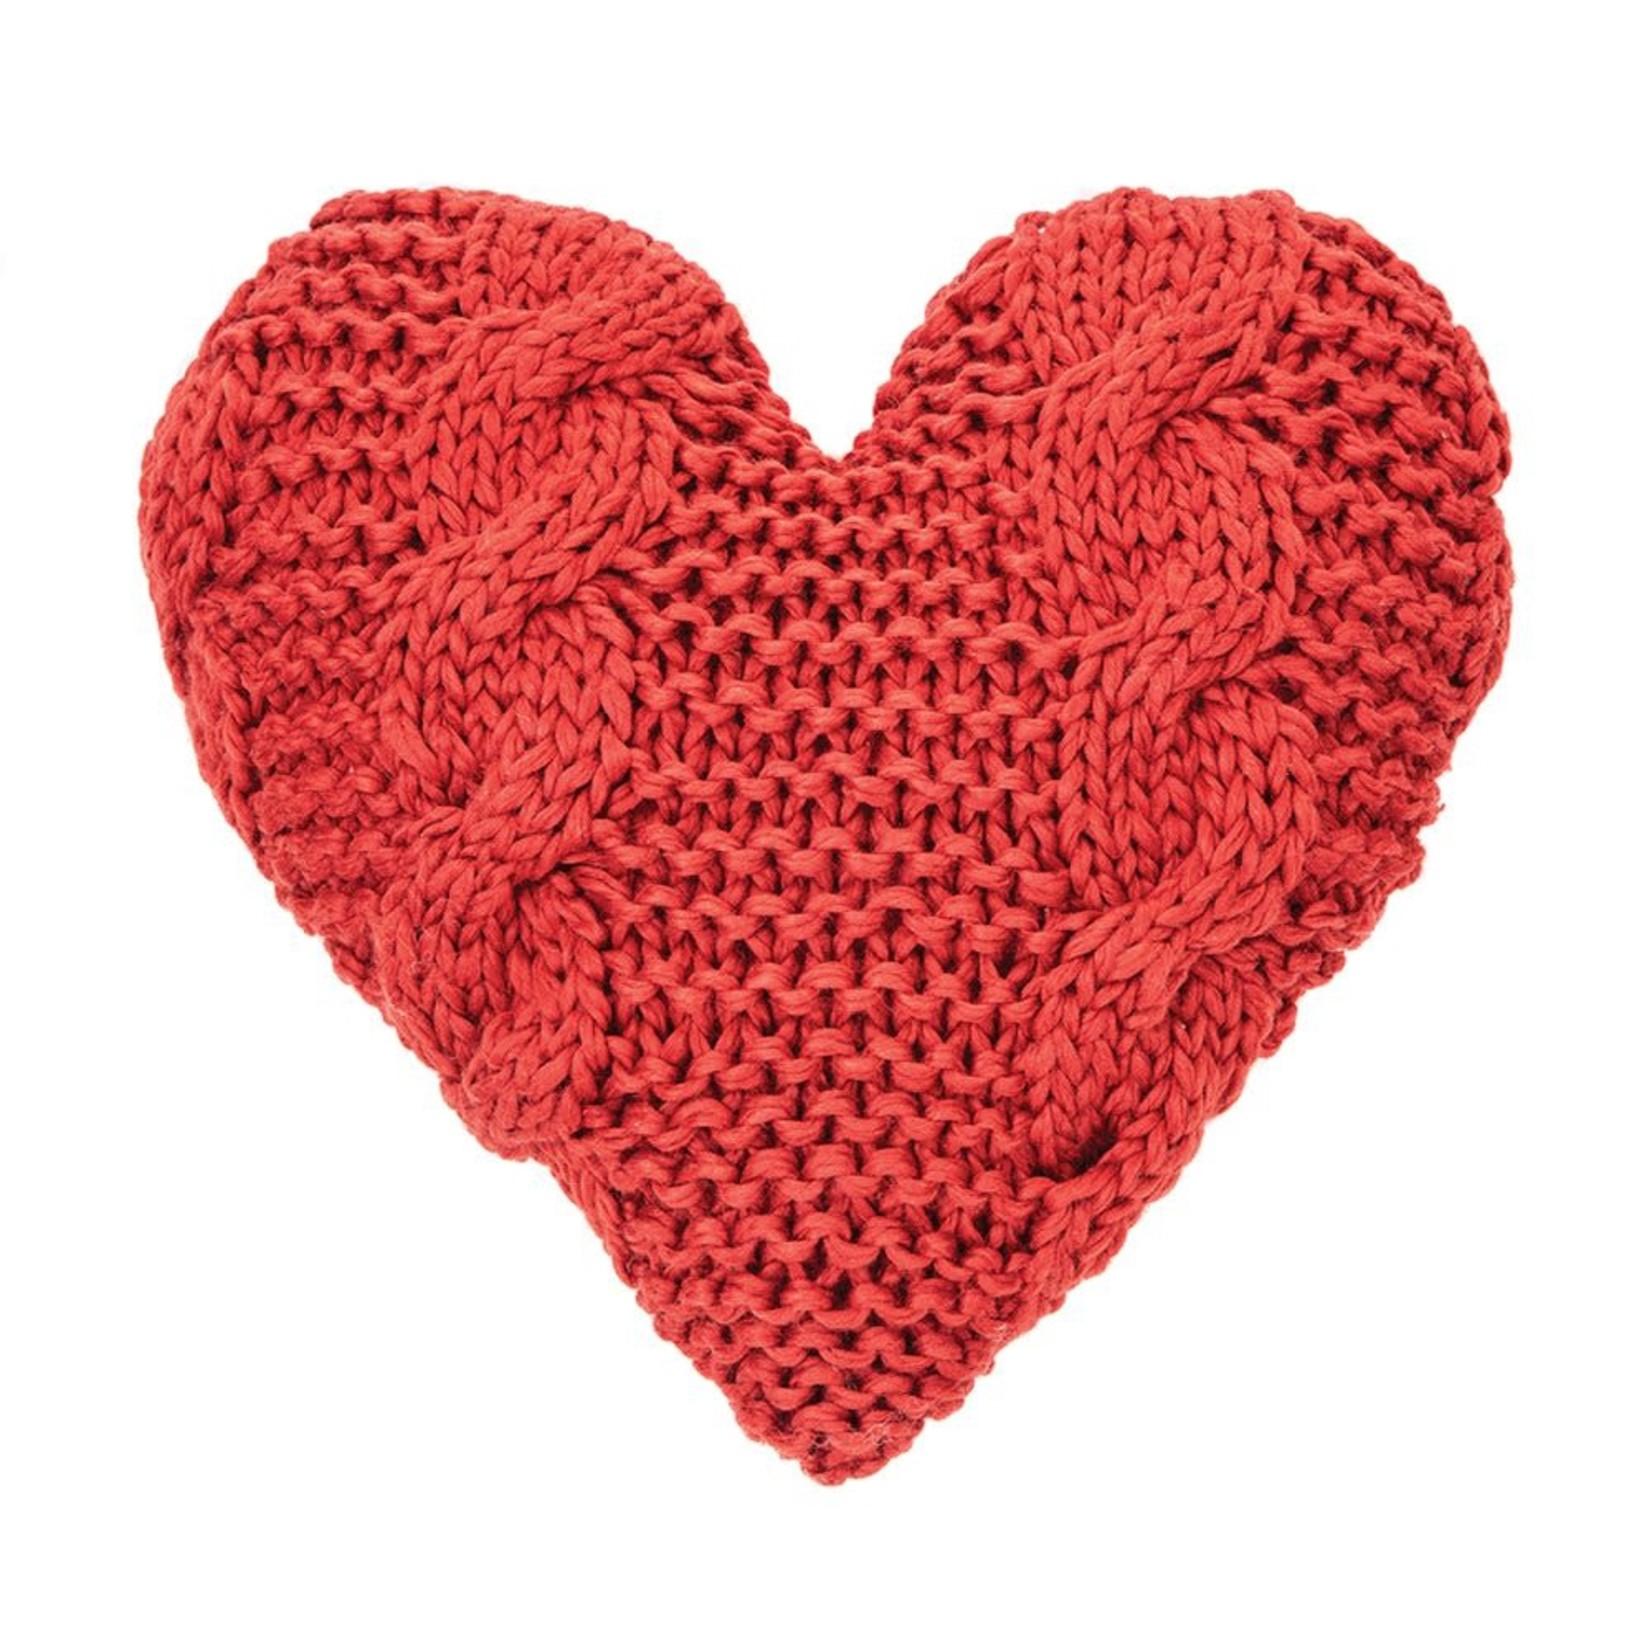 Cinnamon Heart Cushion